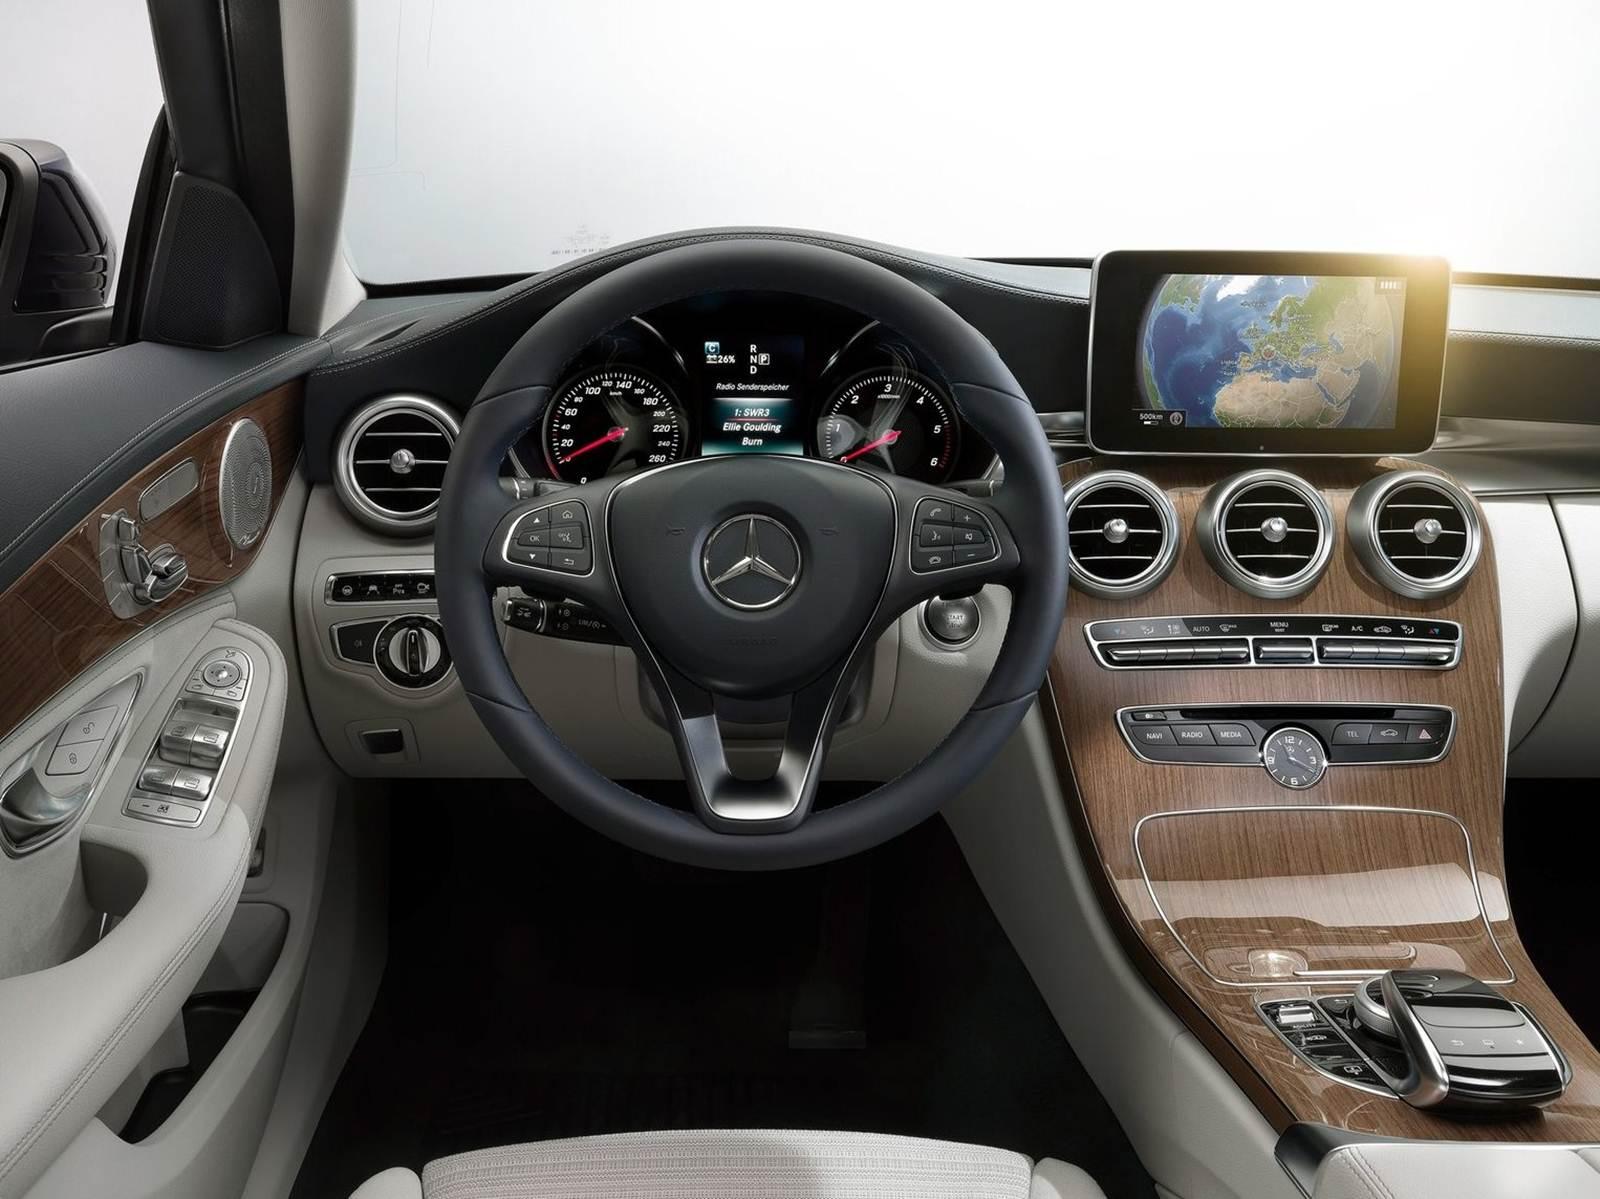 Novo Mercedes Classe C - preço no Brasil R$ 160 mil   CAR ...